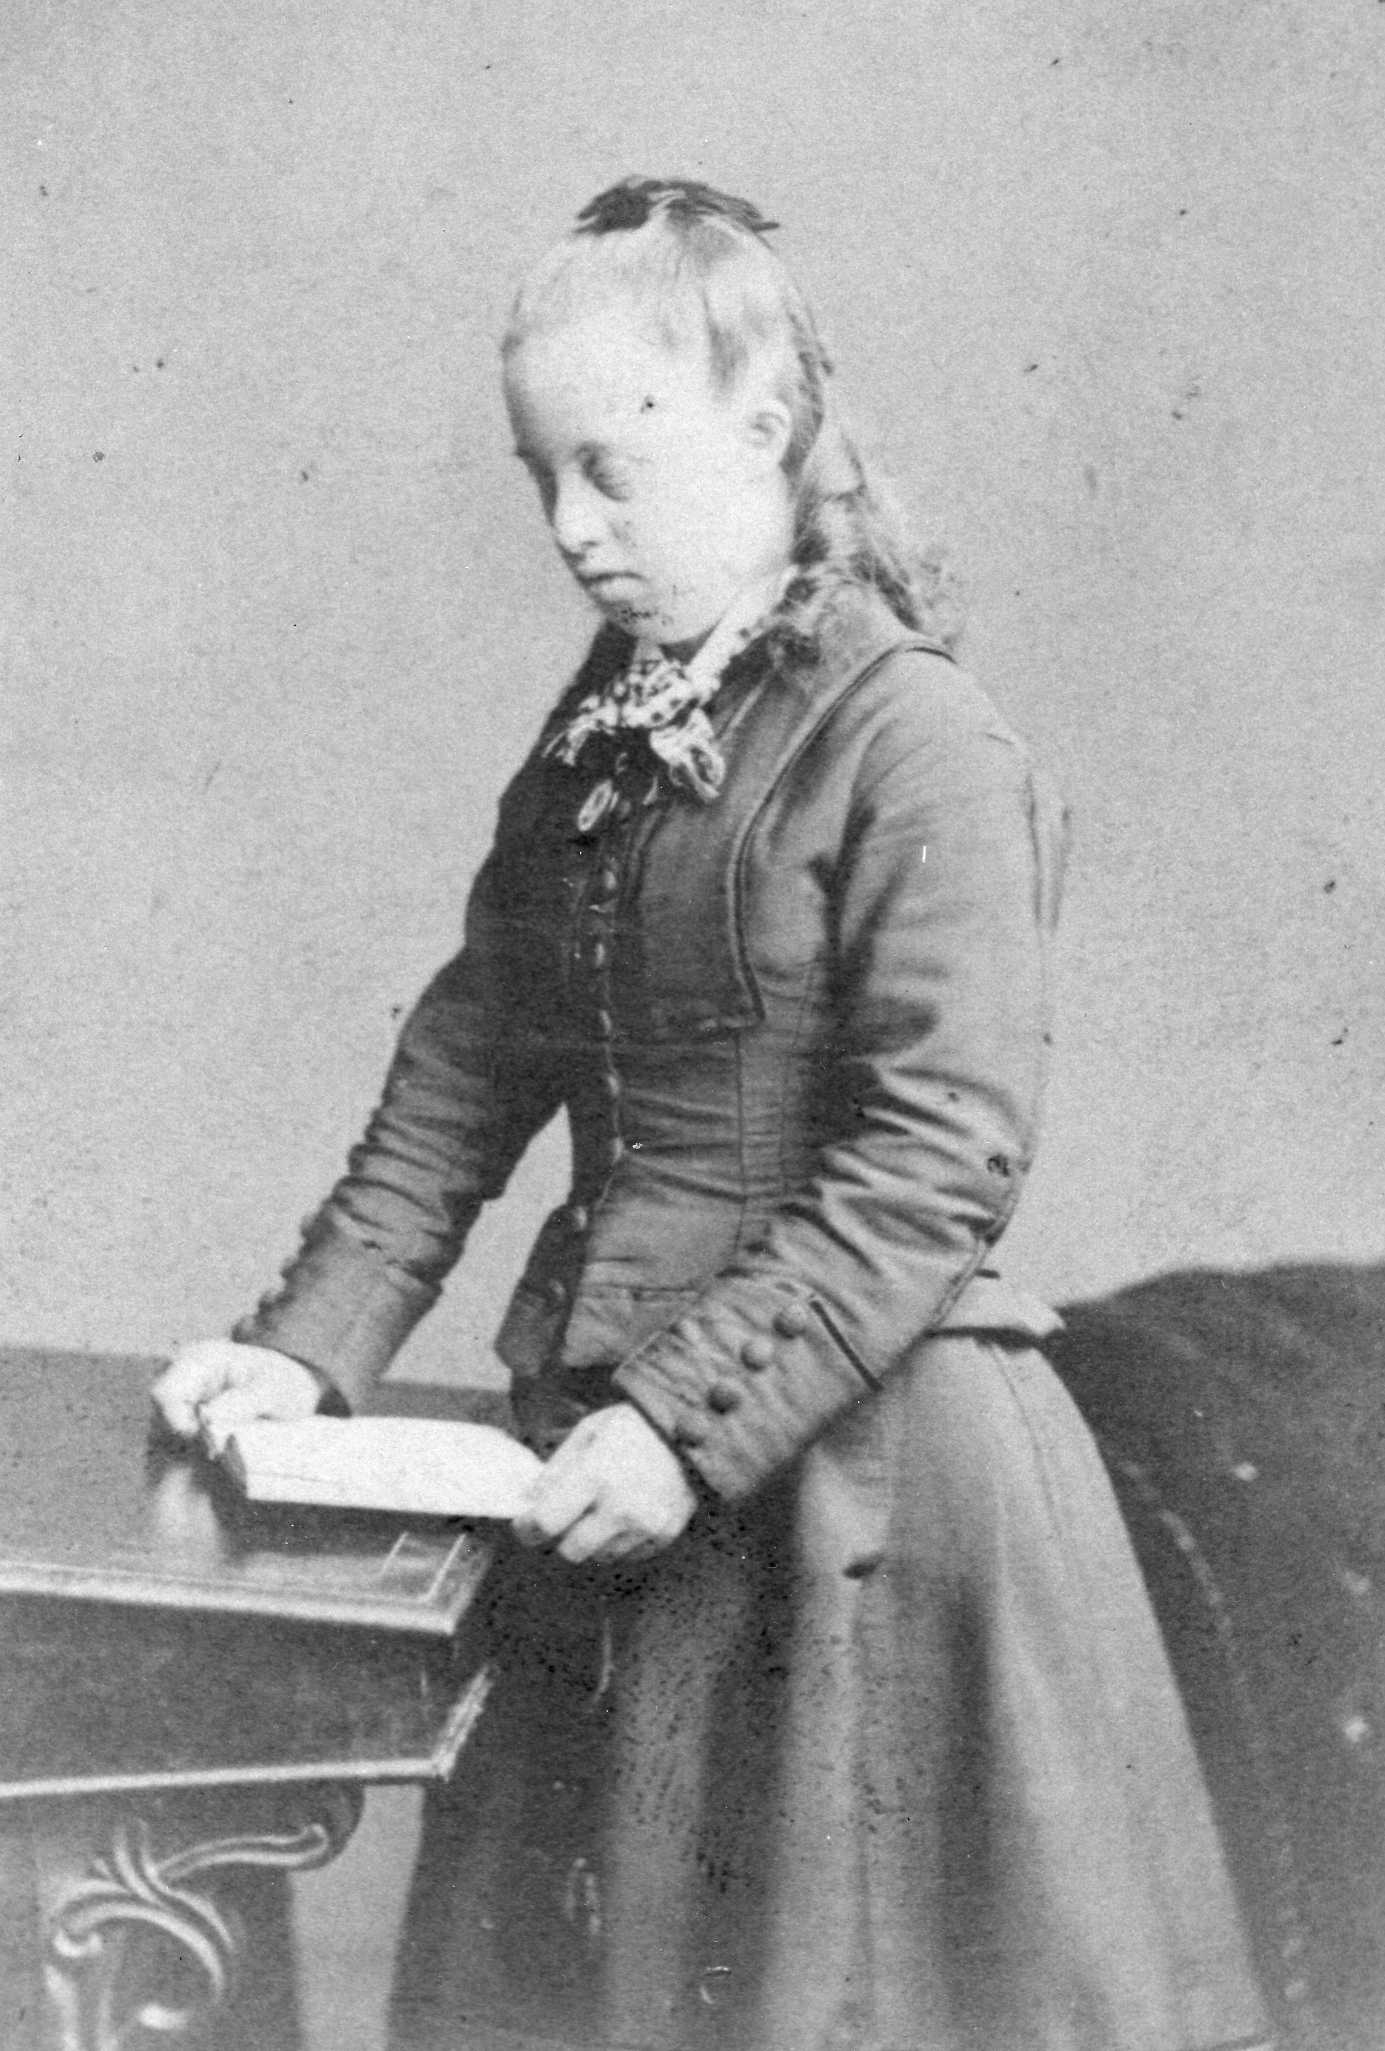 Mary Arnott age 19 years